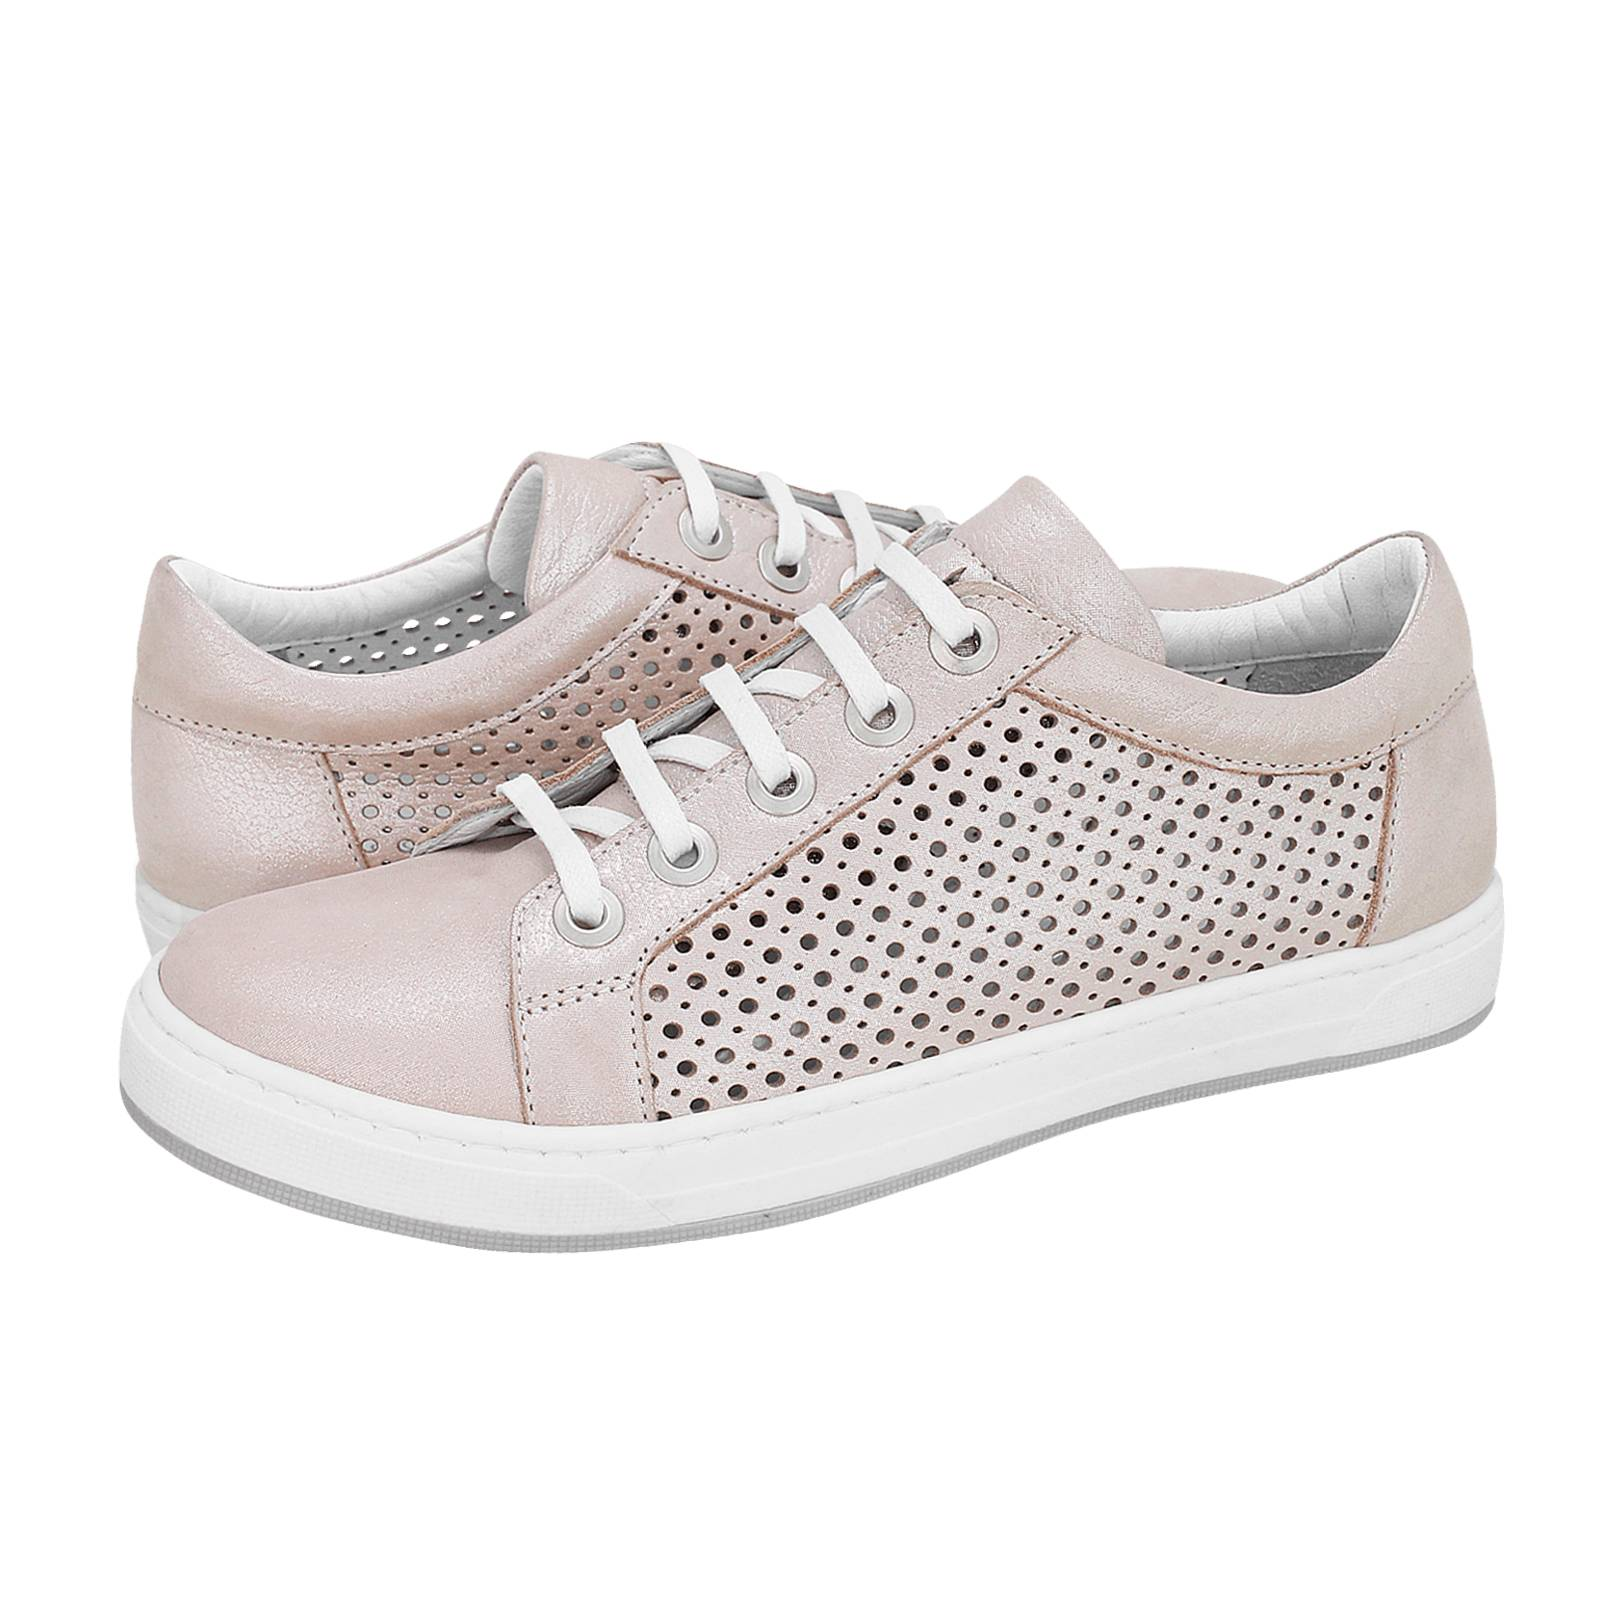 Coventry - Γυναικεία παπούτσια casual Gianna Kazakou από δερμα ... 1b2f1f0c96c